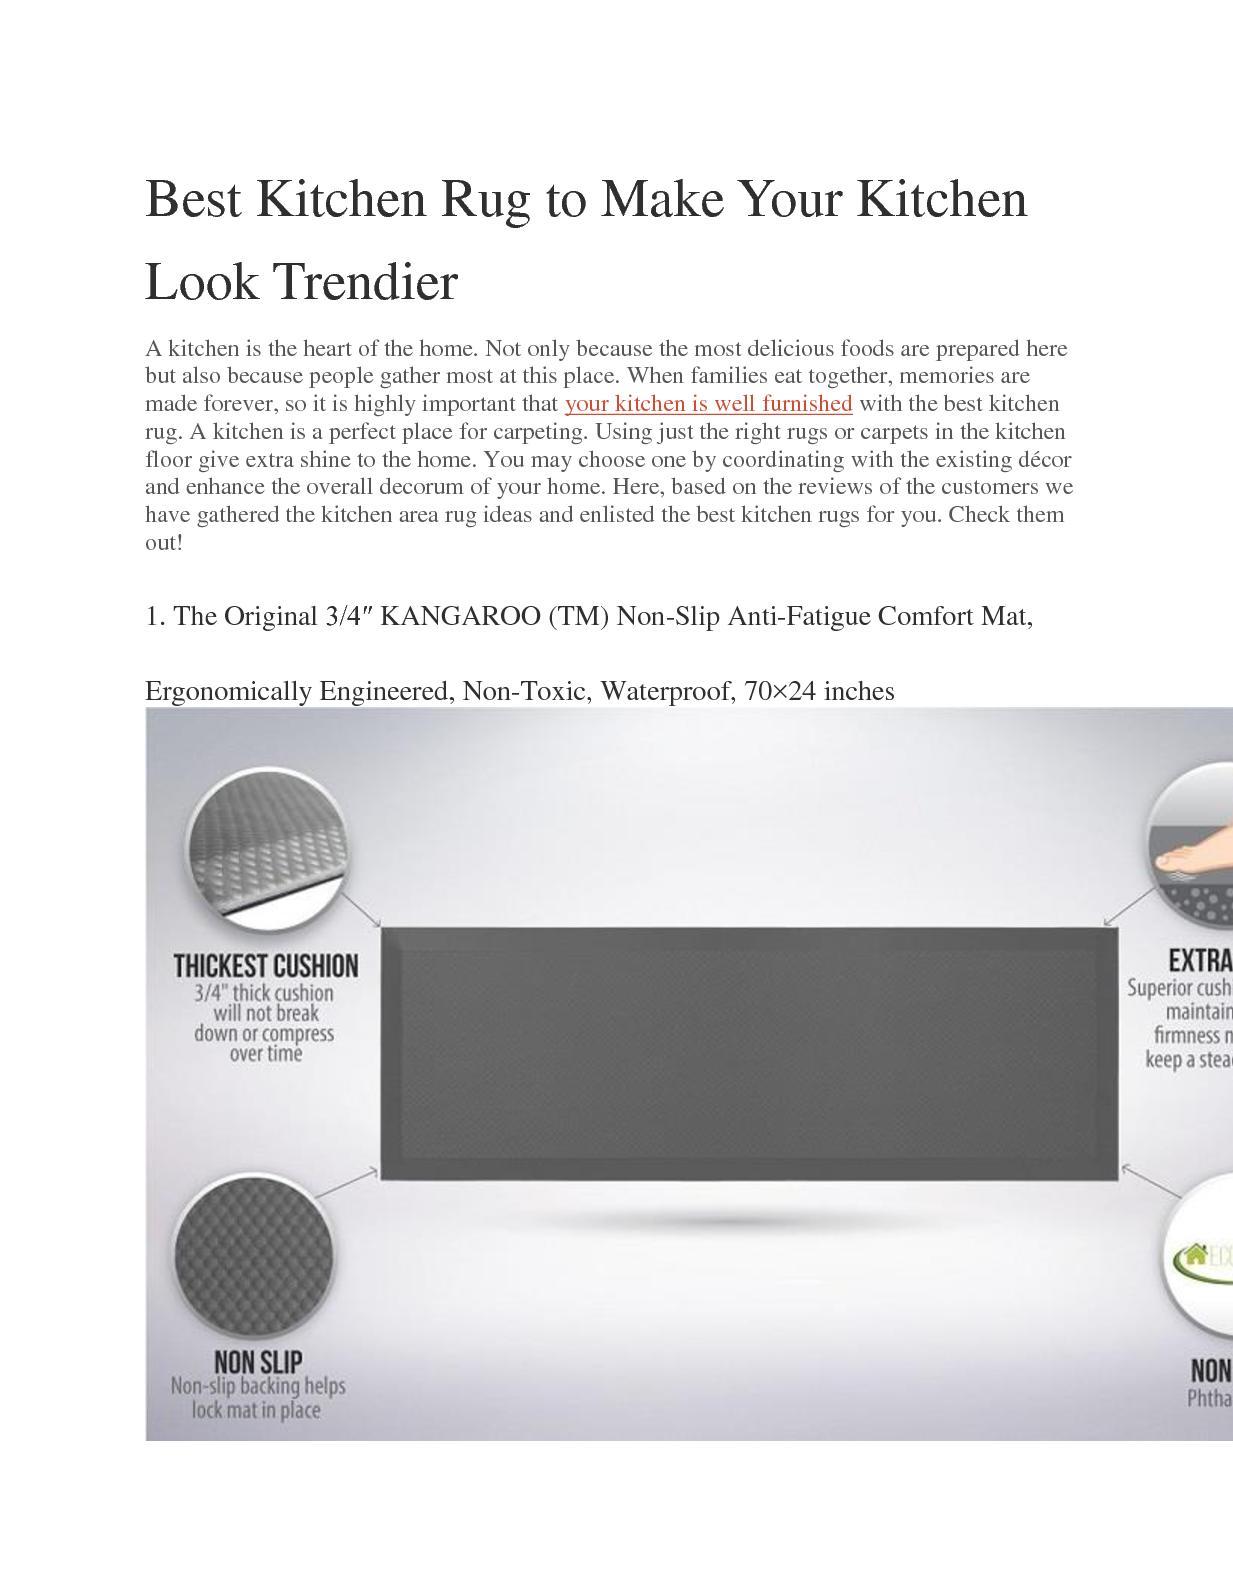 Calameo Best Kitchen Rug To Make Your Kitchen Look Trendier